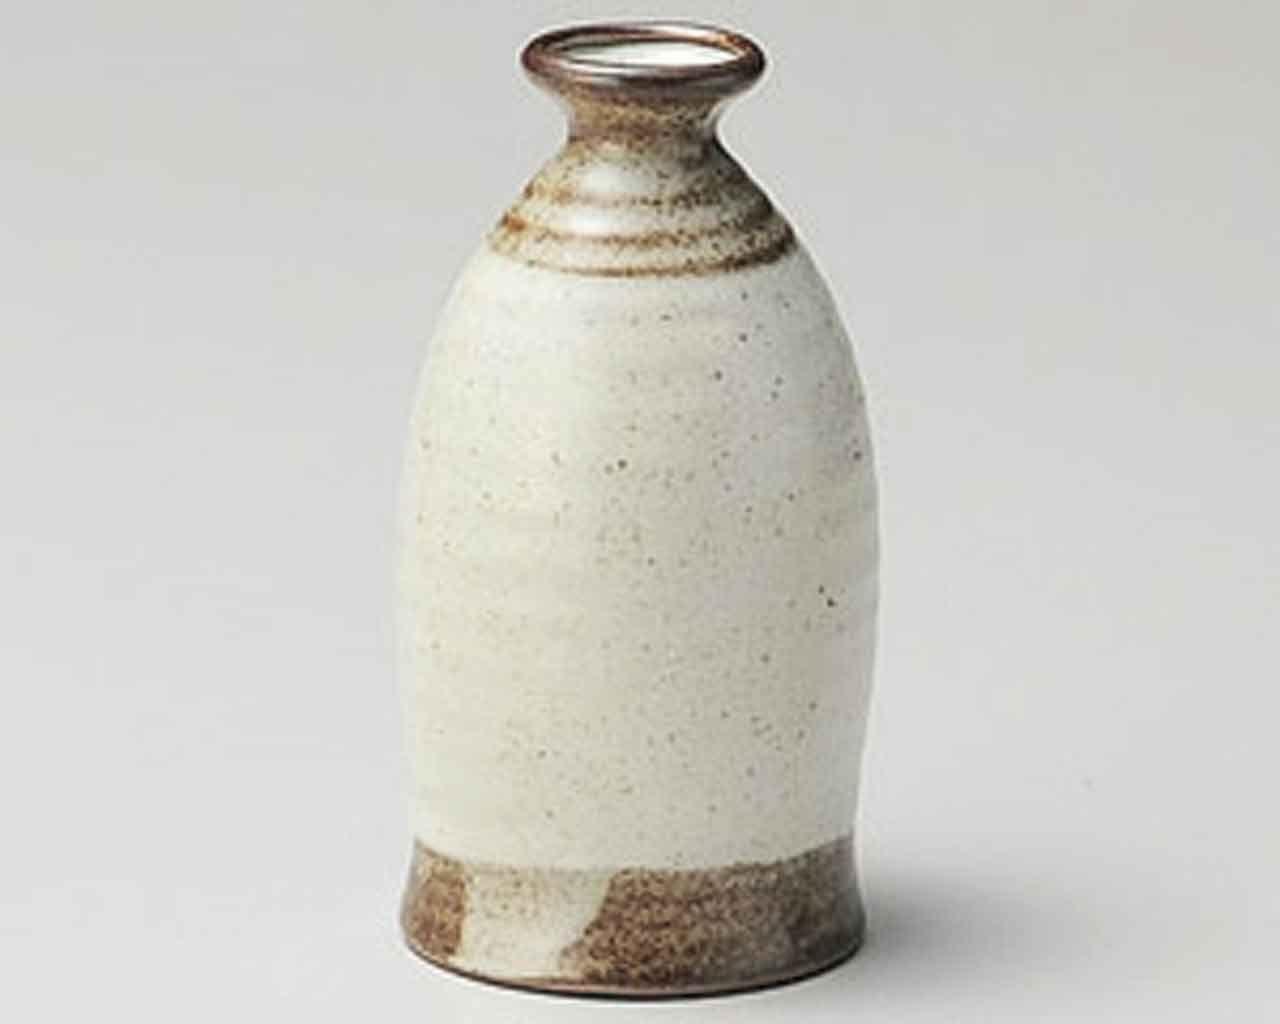 Kobiki Karatsu 2.8inch Sake carafe Beige Ceramic Made in Japan